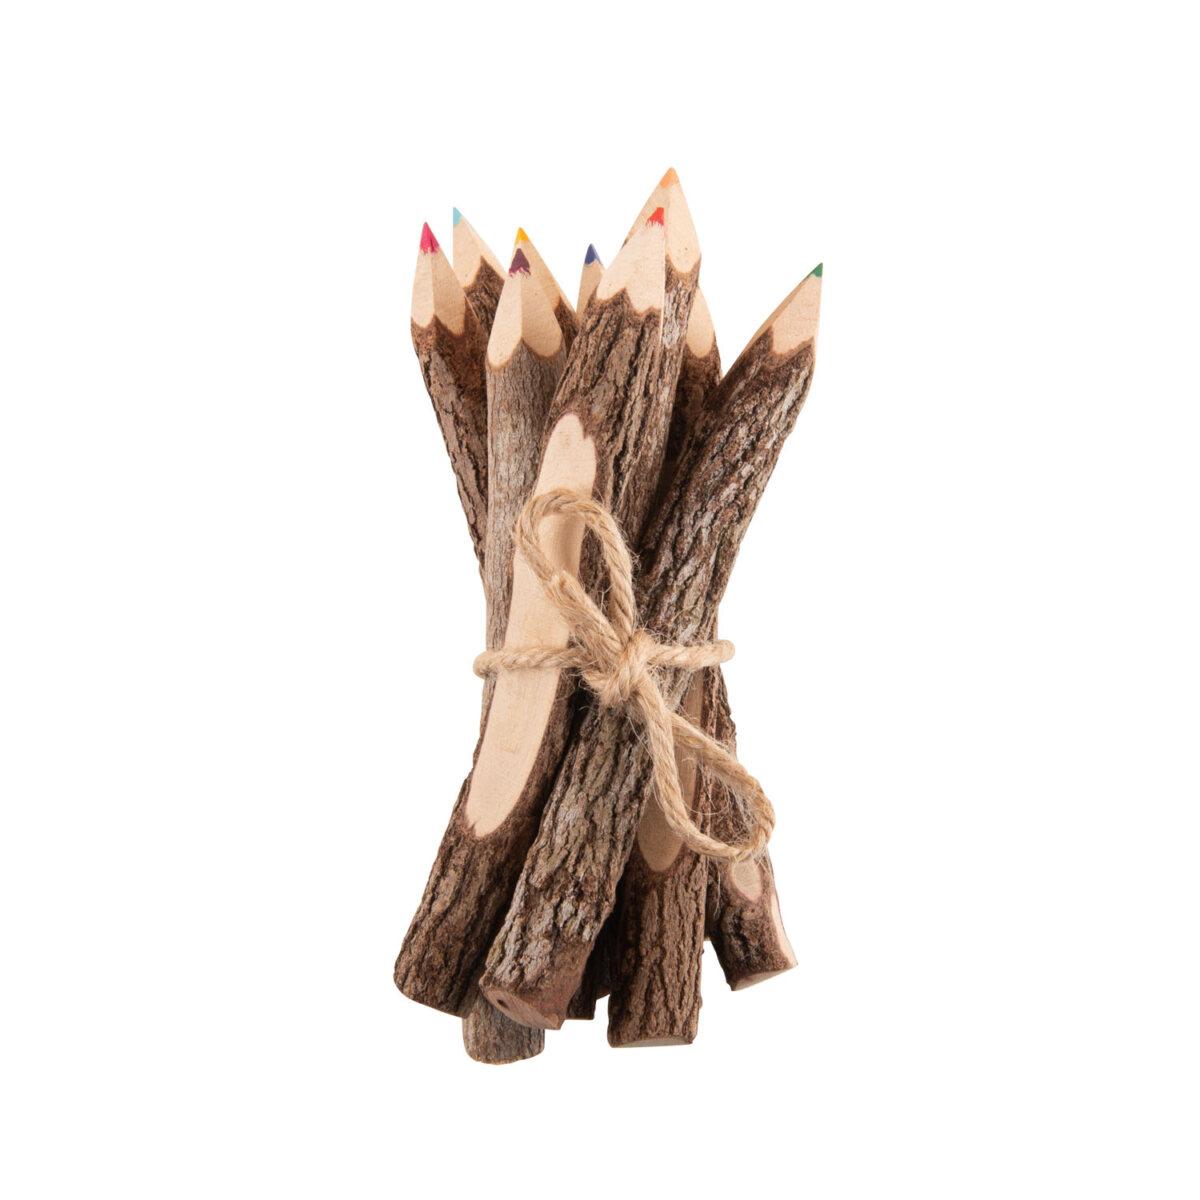 wooden coloured pencils